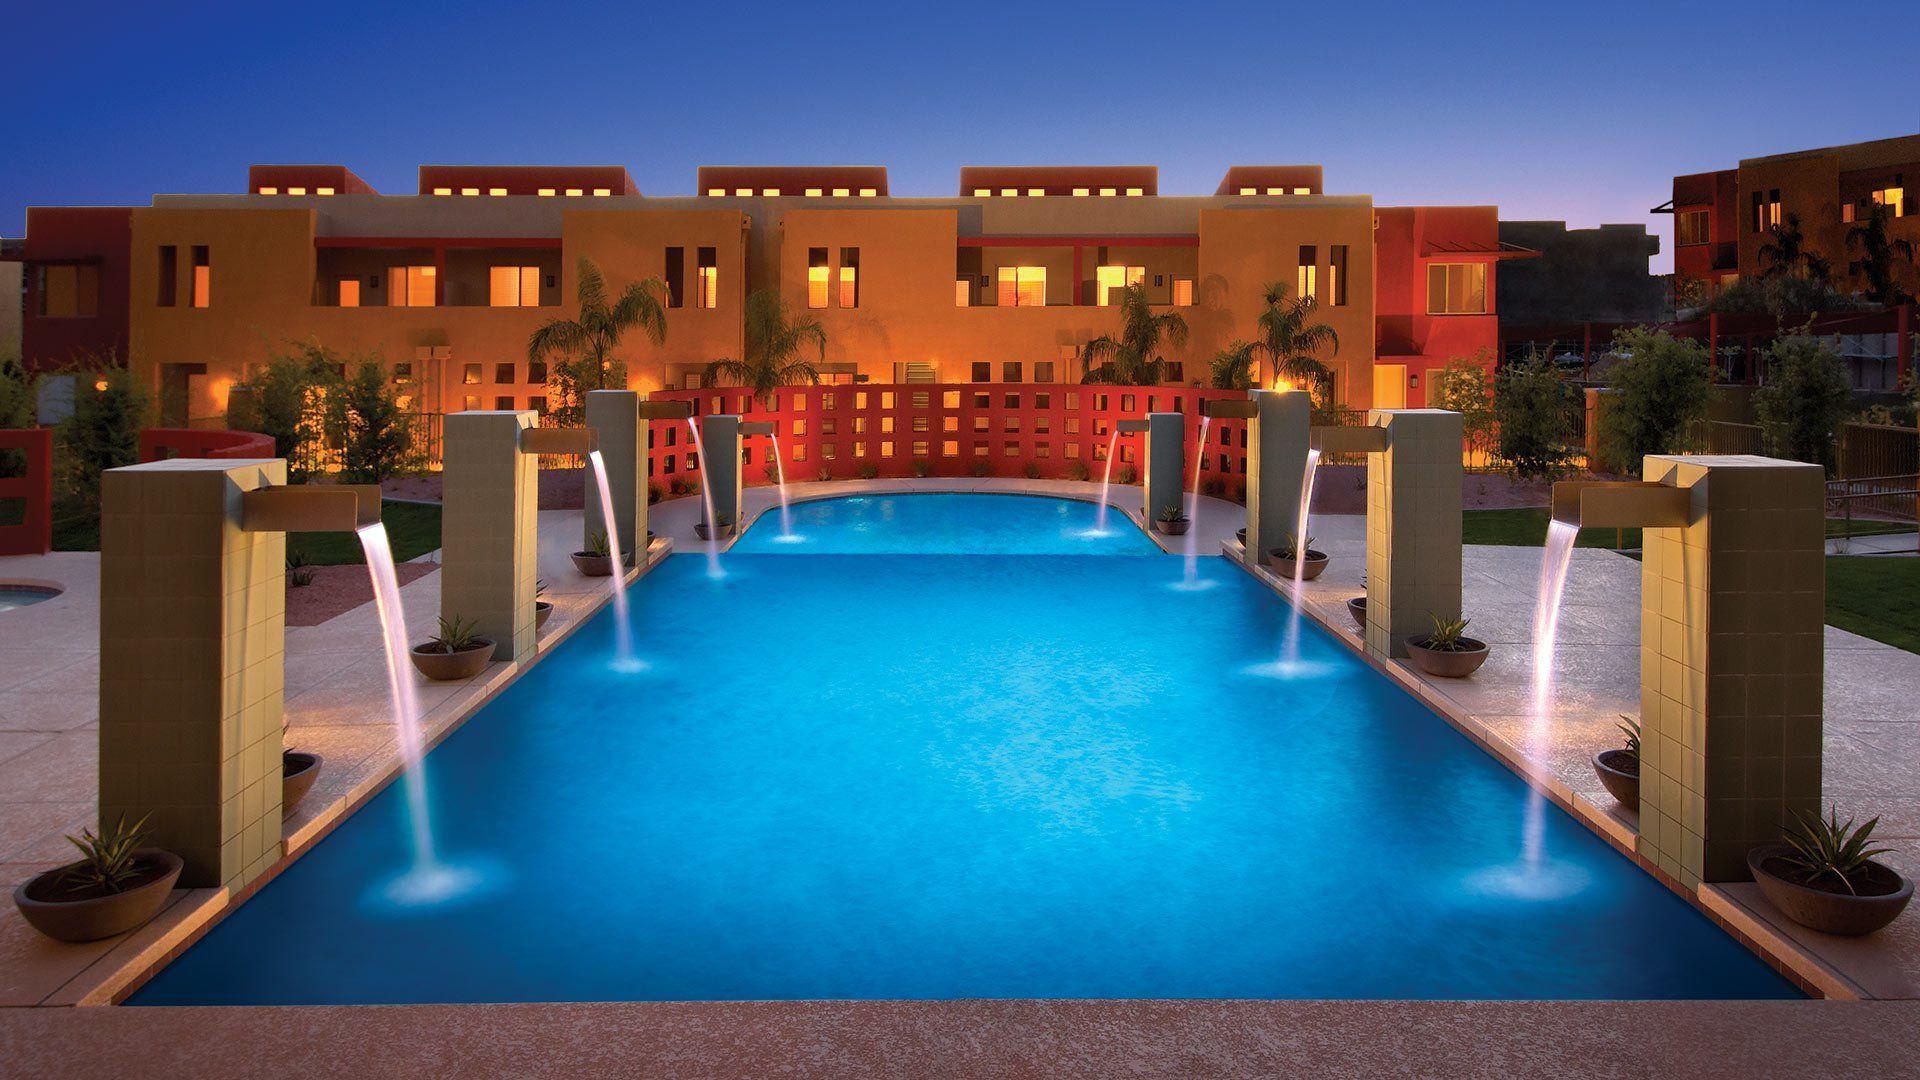 Mark Taylor Homes Shade Apartments At Desert Ridge Apartments Near Phoenix Arizona Las Vegas Apartments Condos For Rent Townhouse For Rent